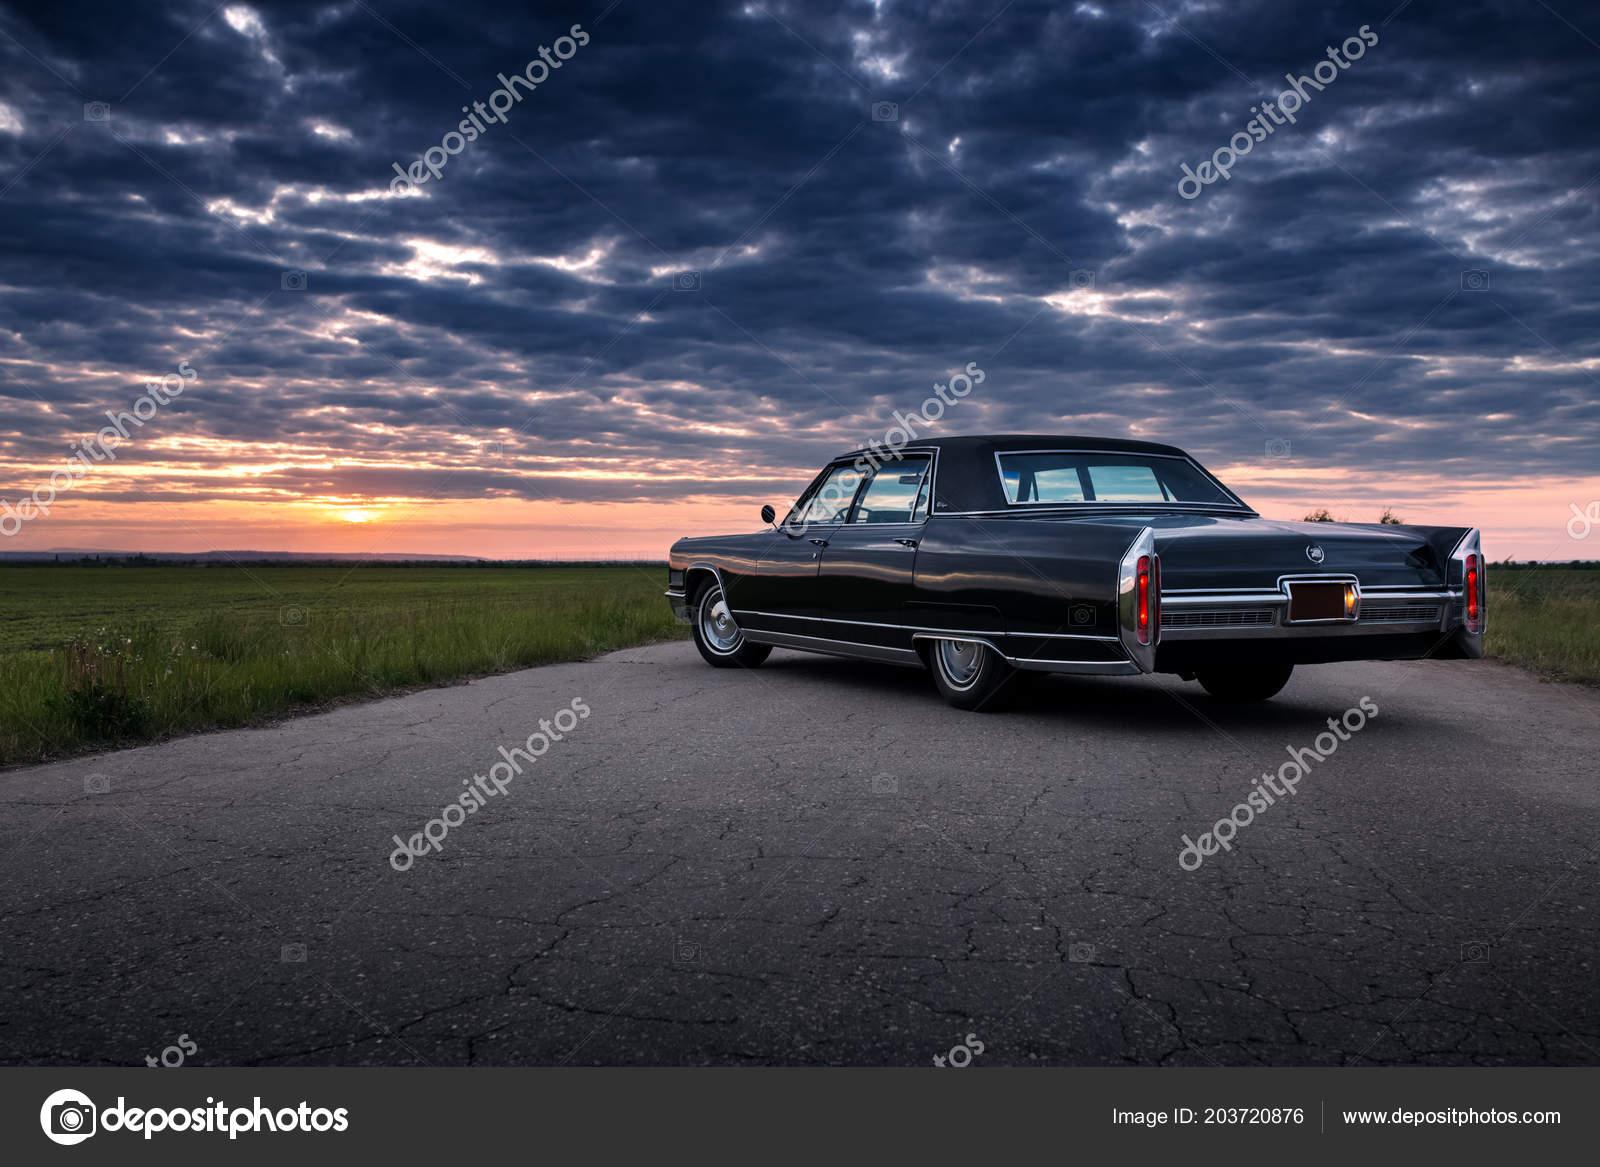 Engels Russia June 2018 Black Retro Vintage Muscle Car Cadillac